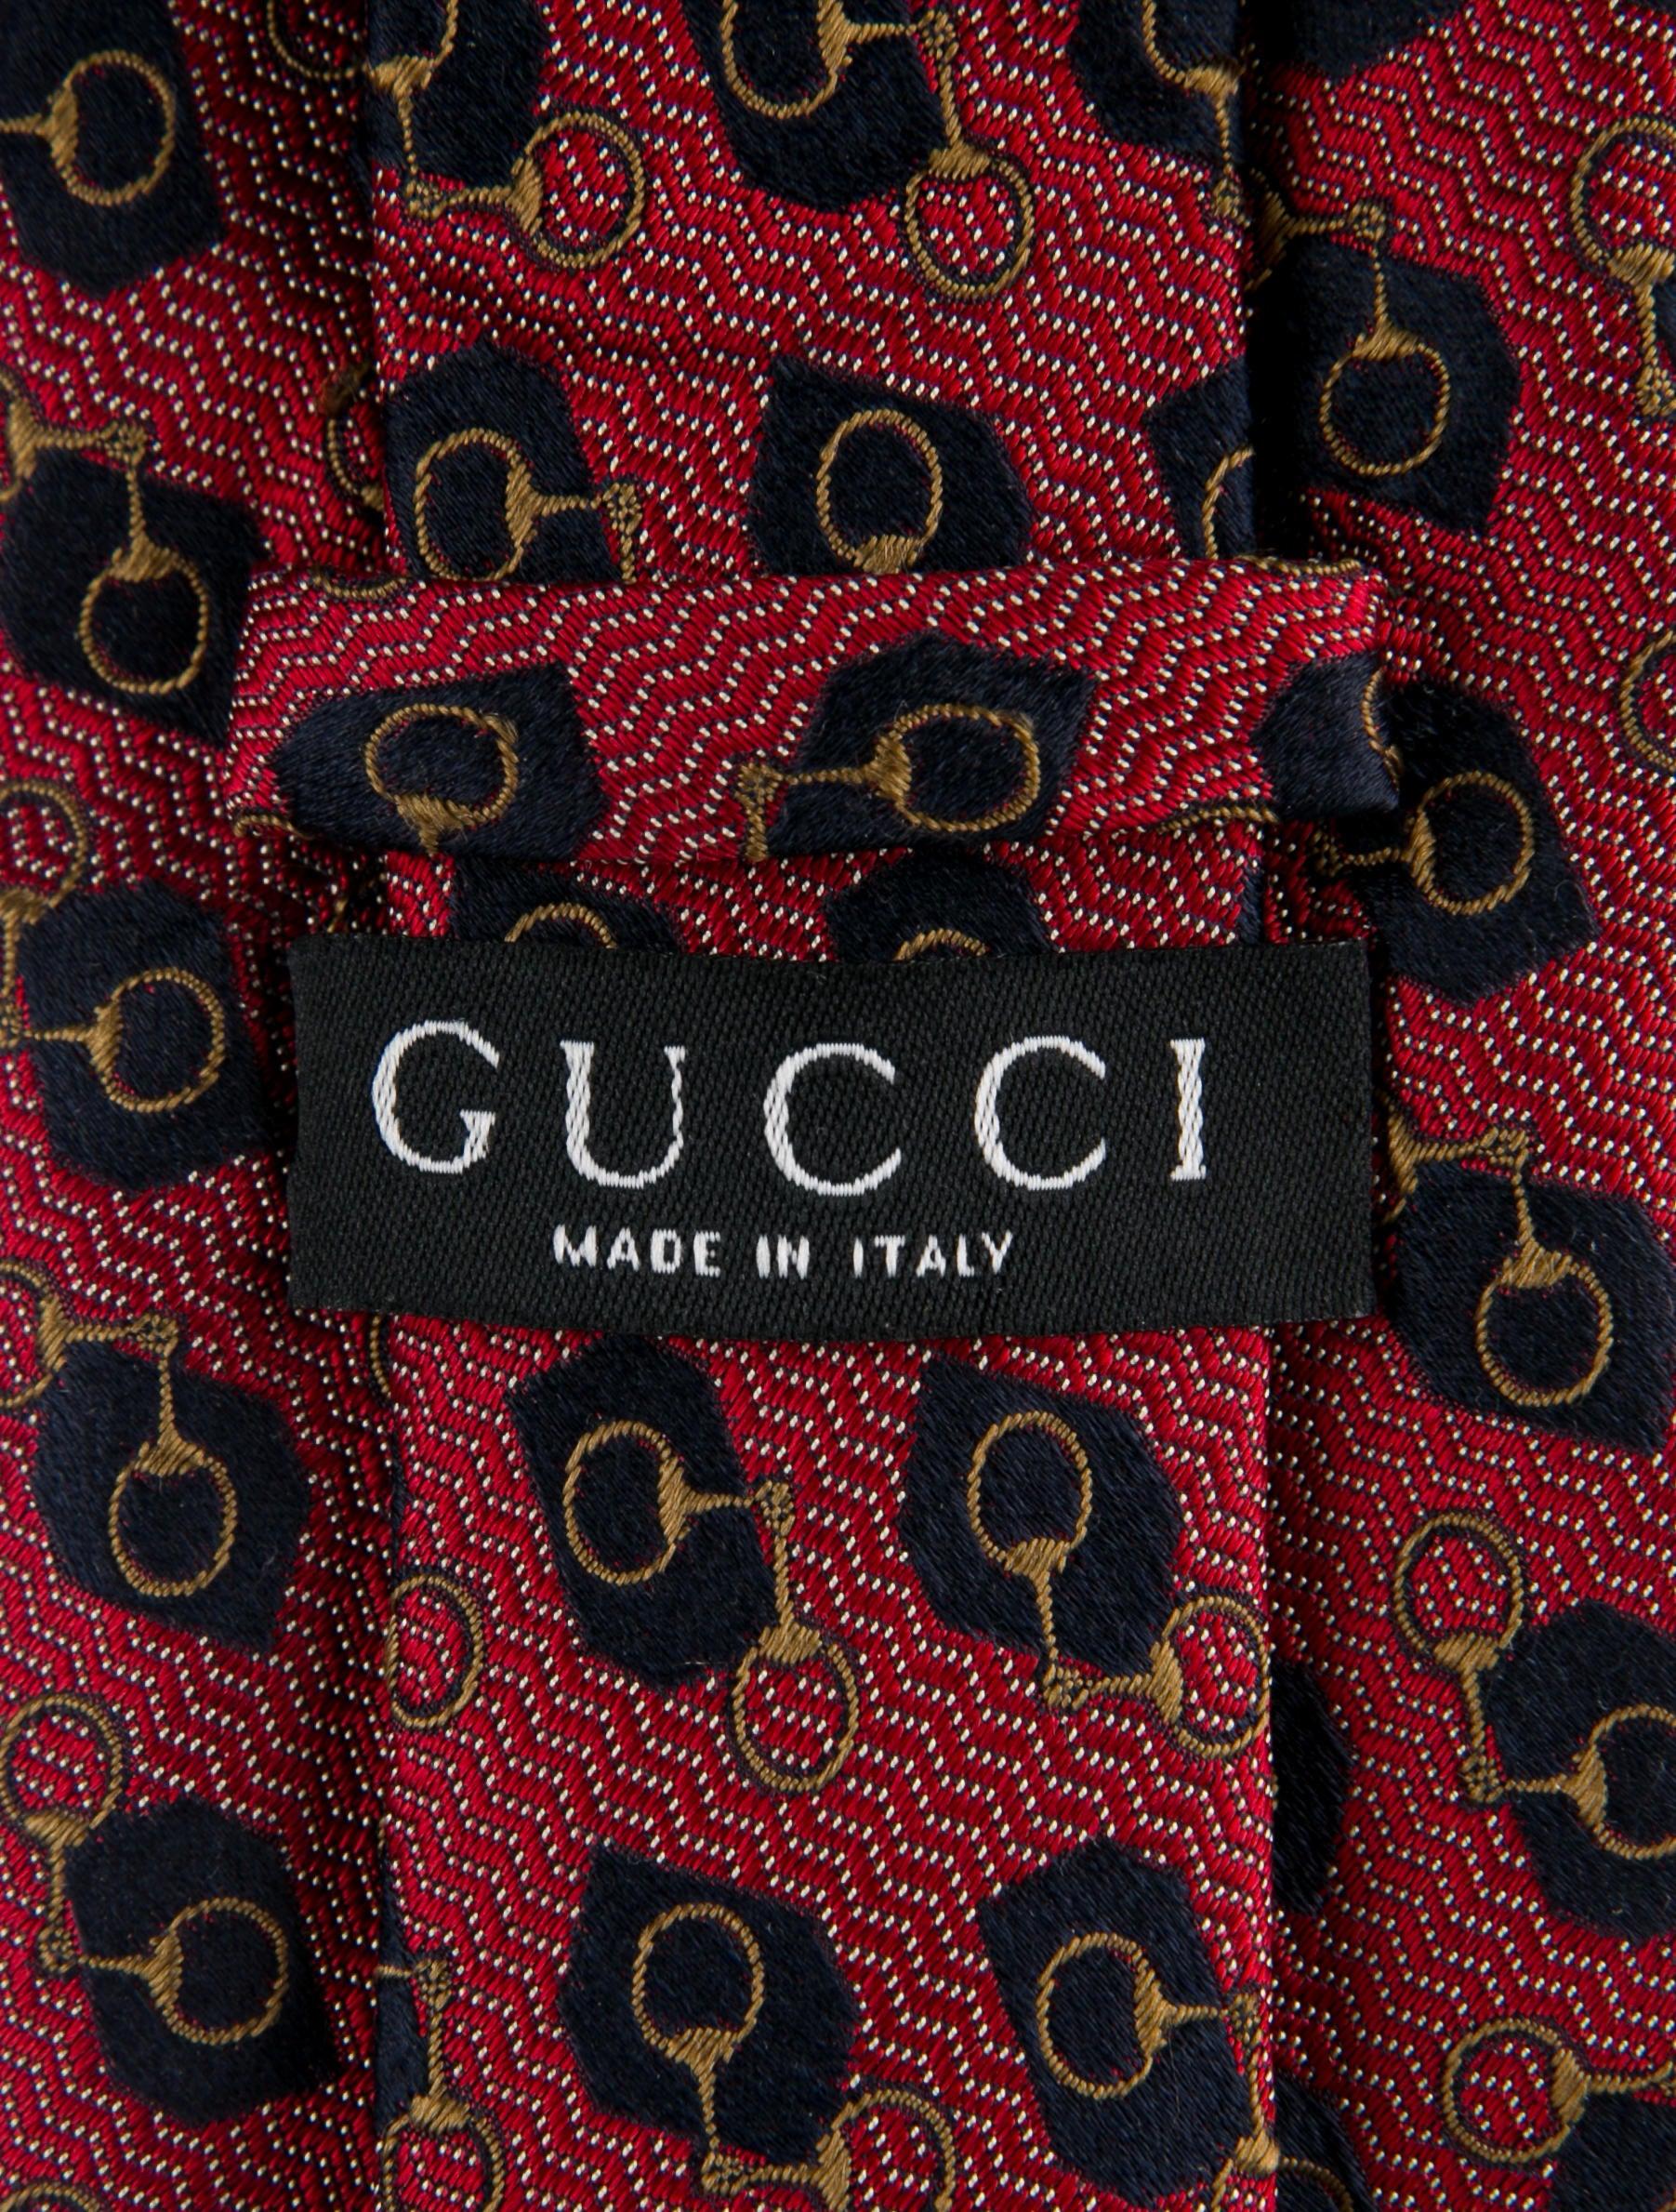 1af1321e7d61 Gucci Horsebit Jacquard Silk Tie - Suiting Accessories - GUC214790 ...